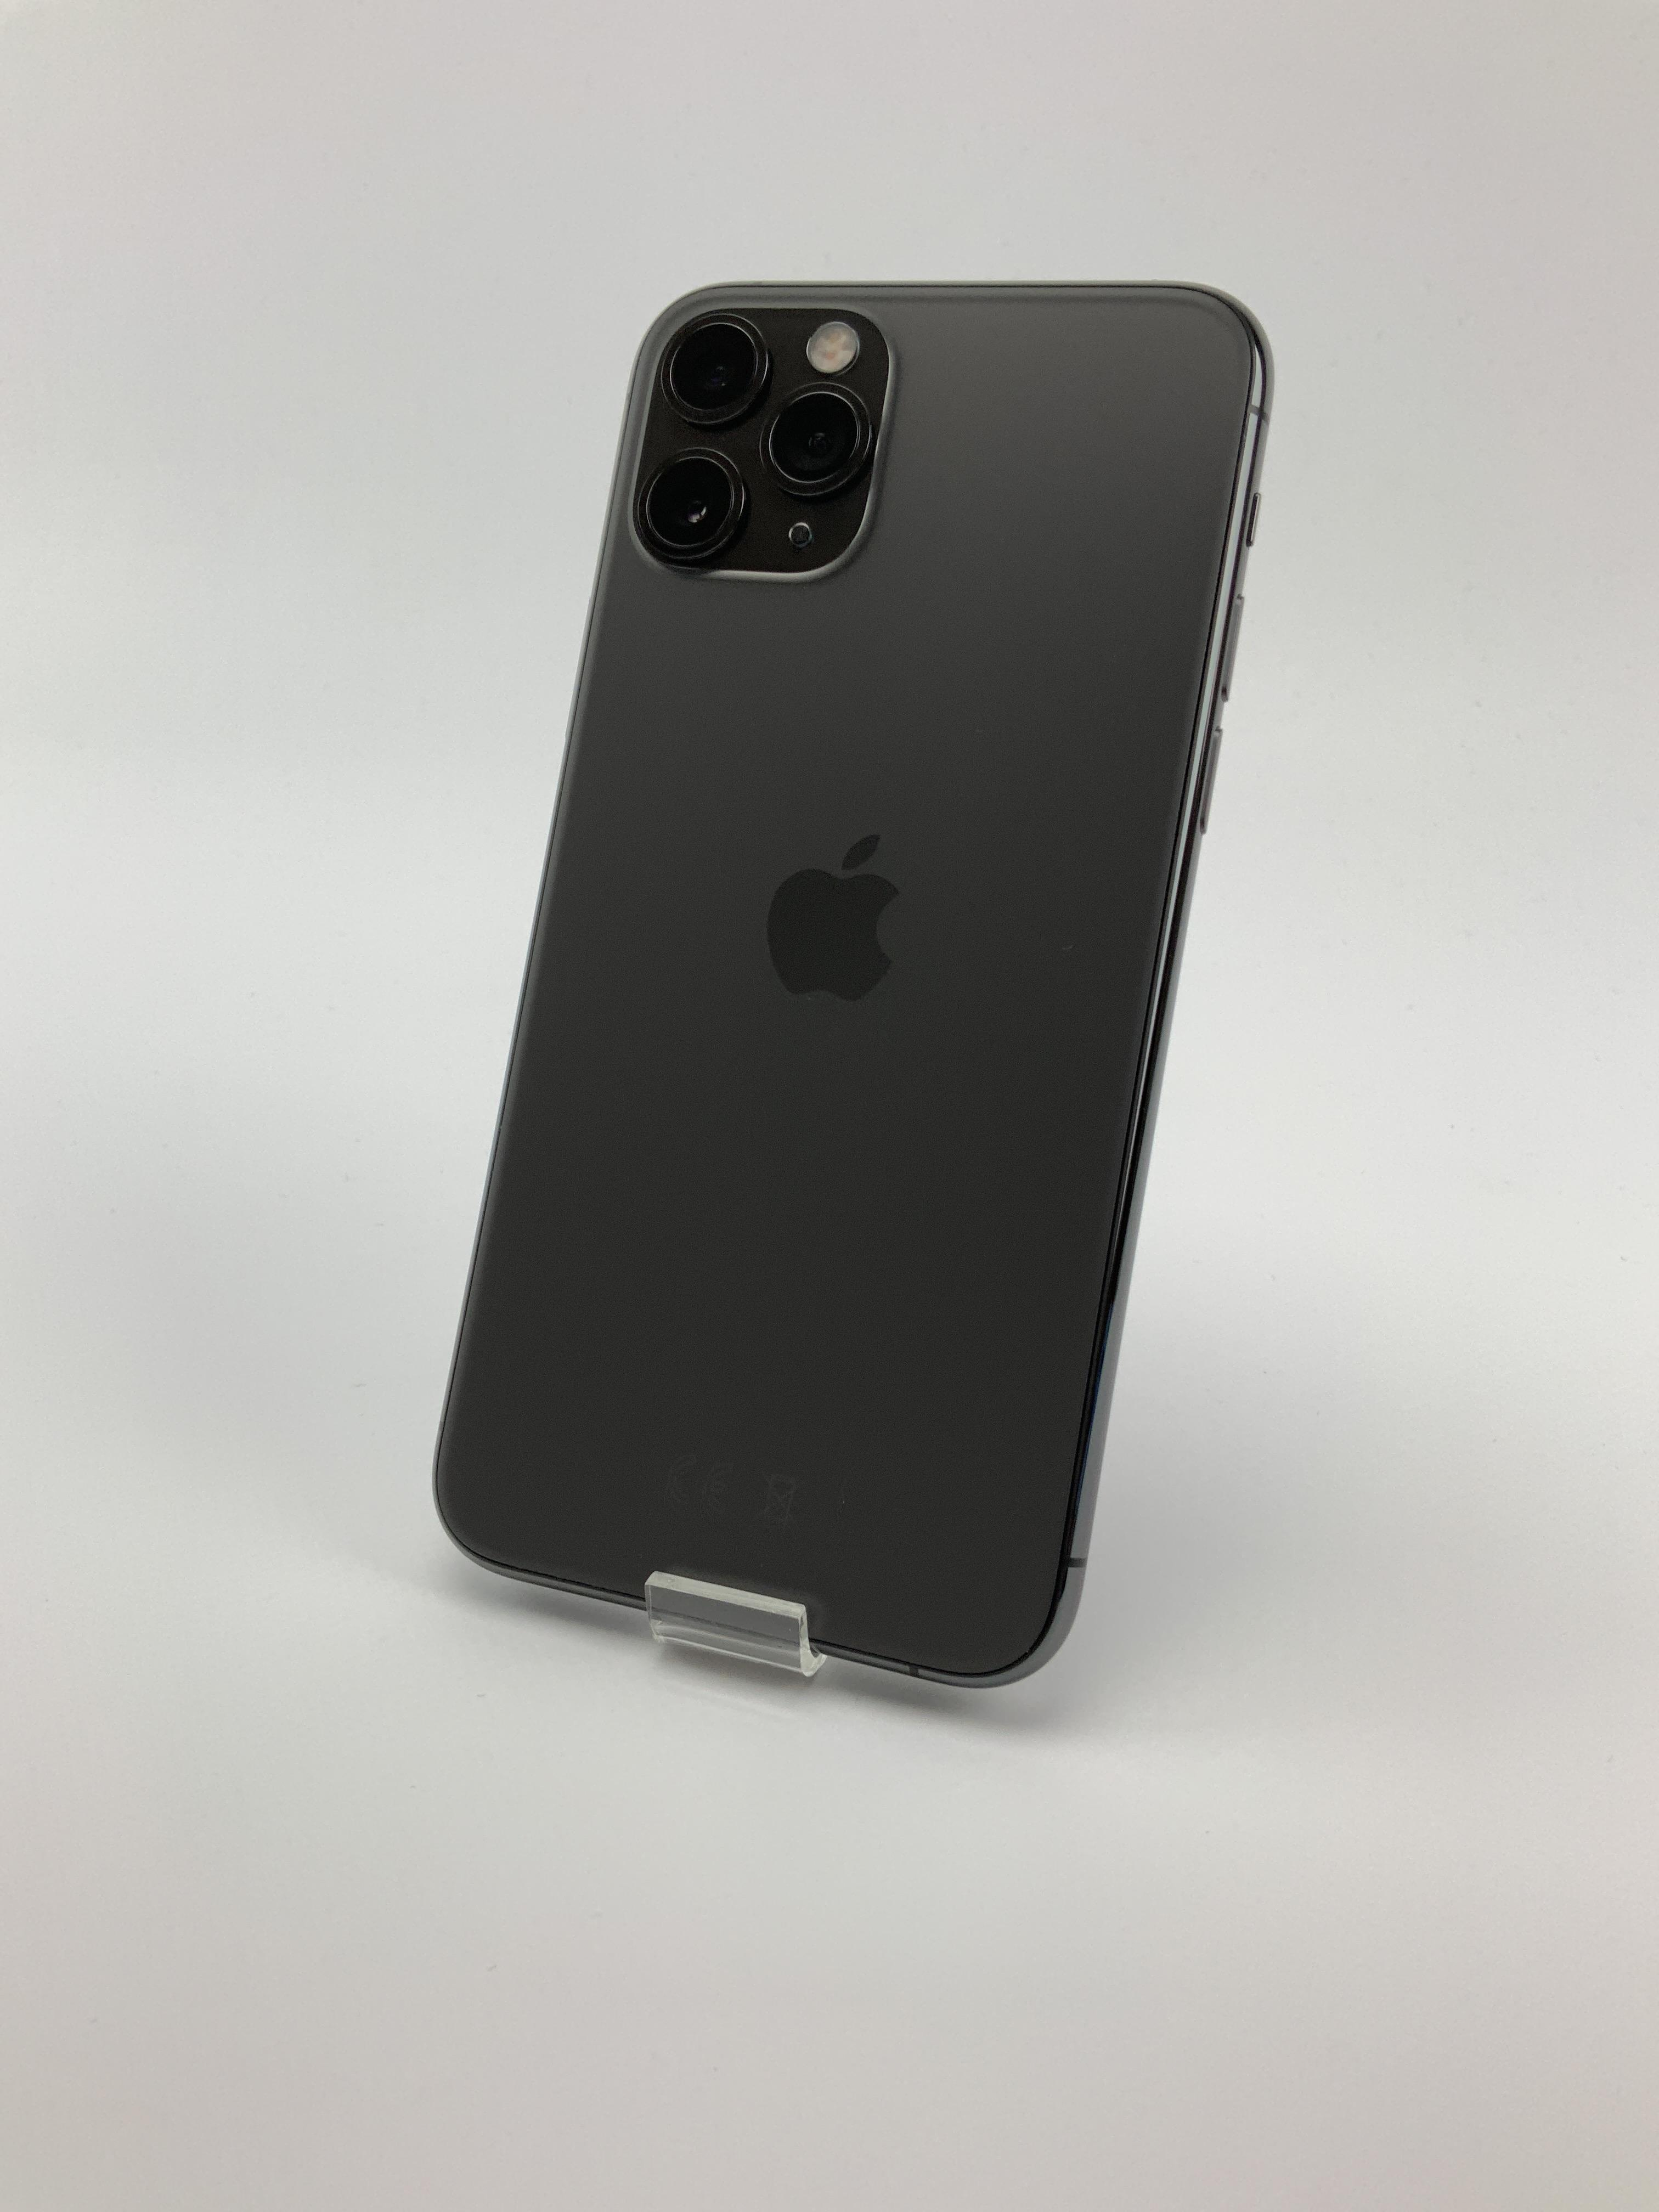 iPhone 11 Pro 64GB, 64GB, Space Gray, imagen 2